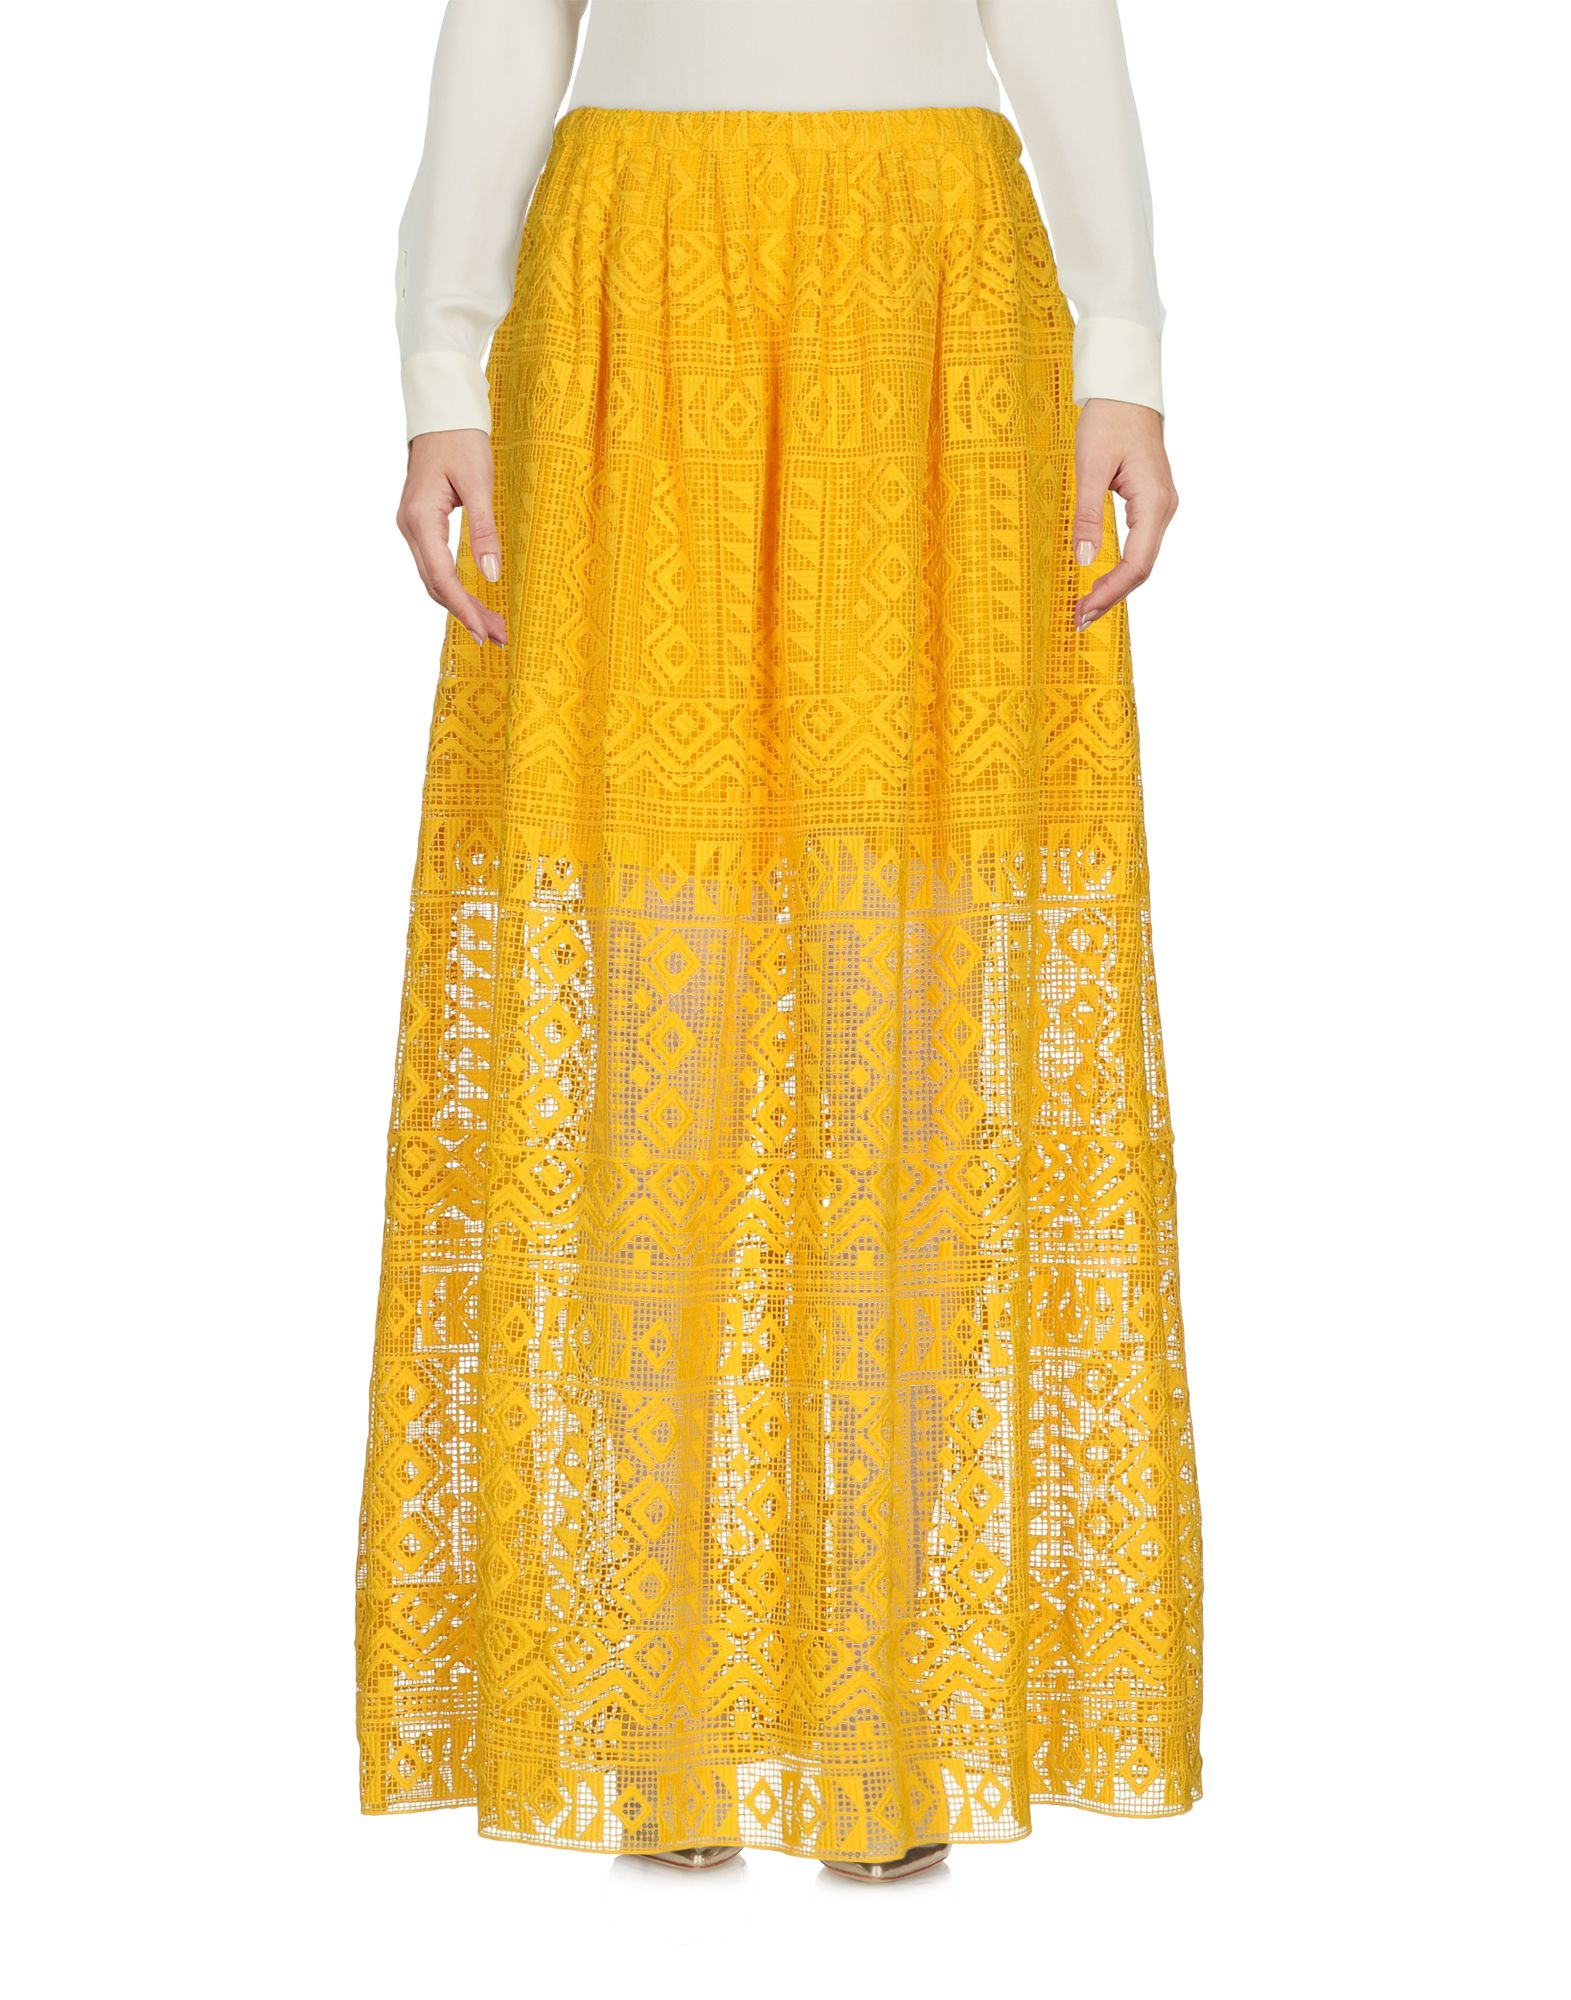 PHILOSOPHY di LORENZO SERAFINI Damen Maxirock Farbe Gelb Größe 5 jetztbilligerkaufen